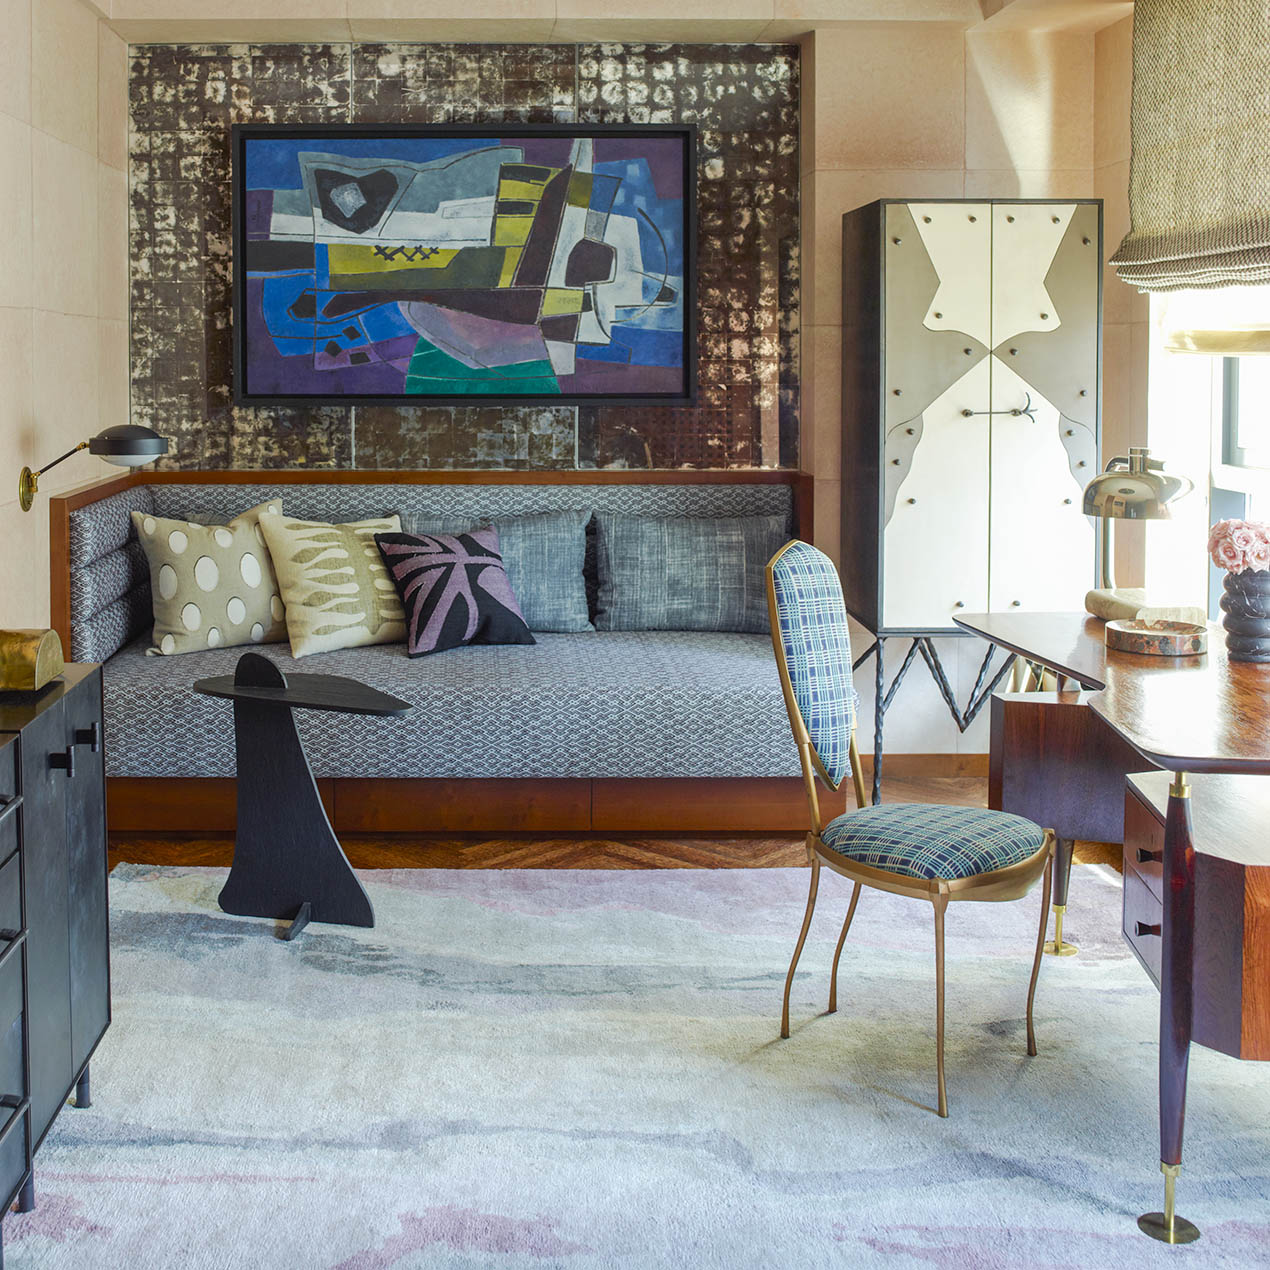 kelly wearstler online store interiors residence designed by kelly rh kellywearstler com kelly wearstler interior design book kelly wearstler interior design book